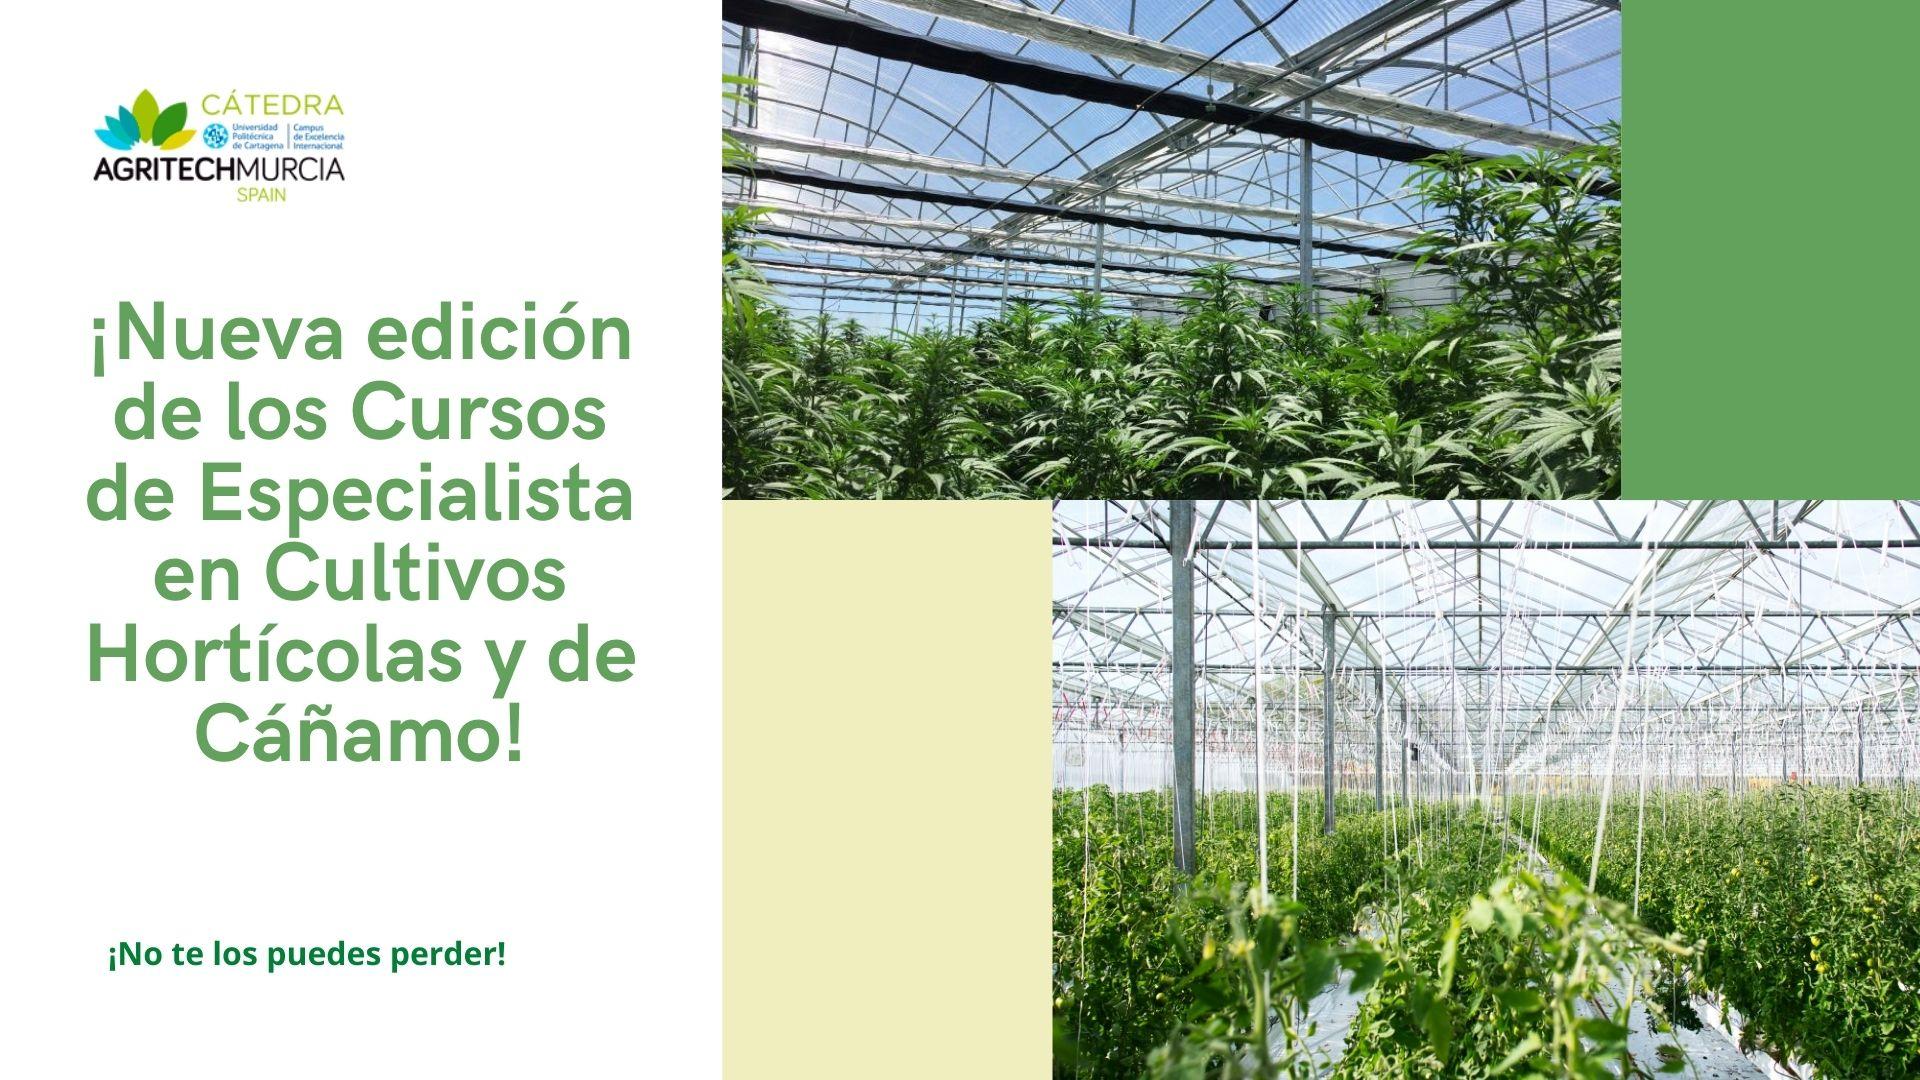 Agritech Murcia